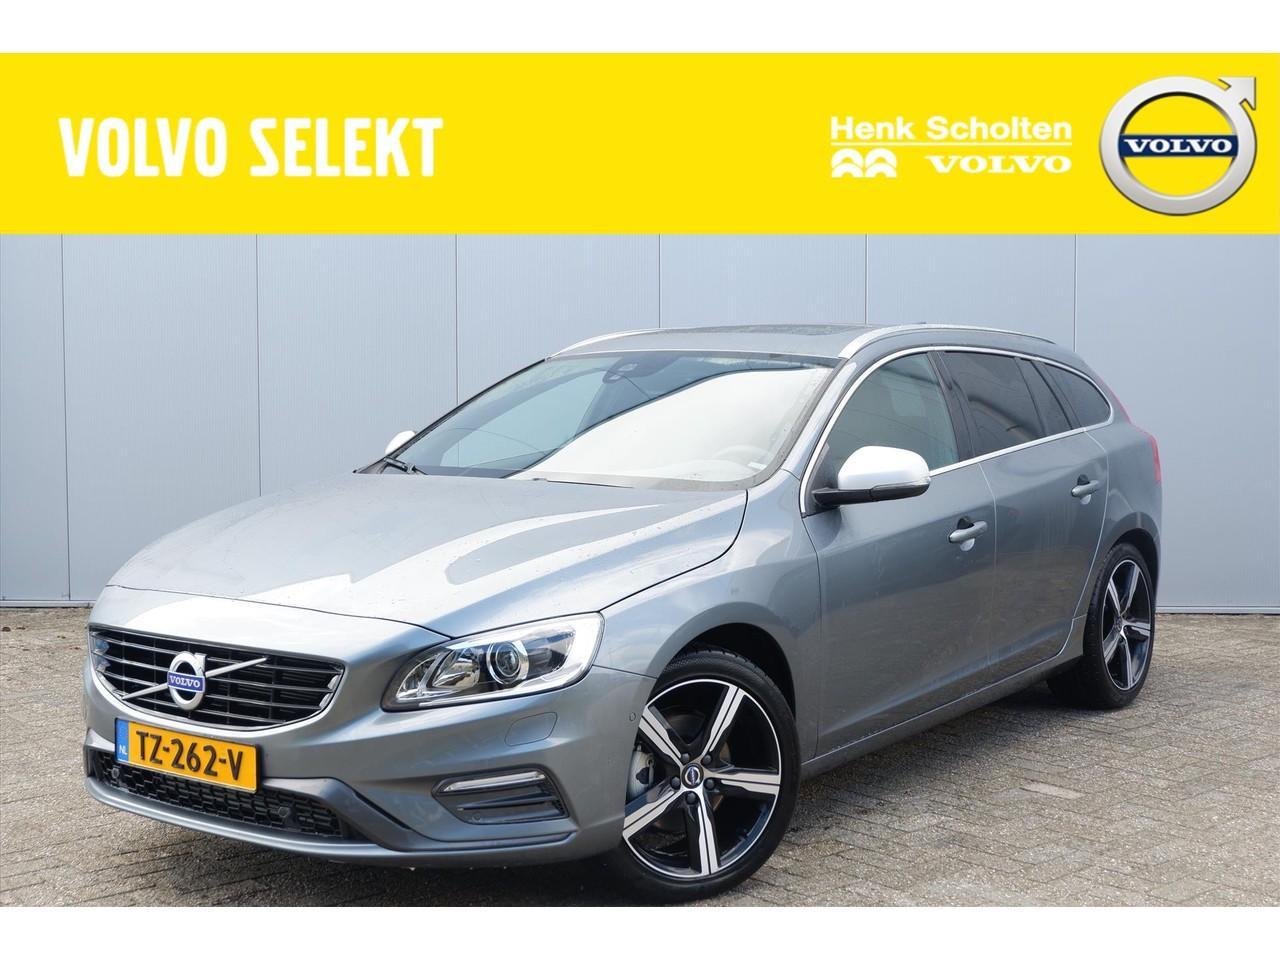 Volvo V60 T4 190pk business sport/luxury/scan.-line